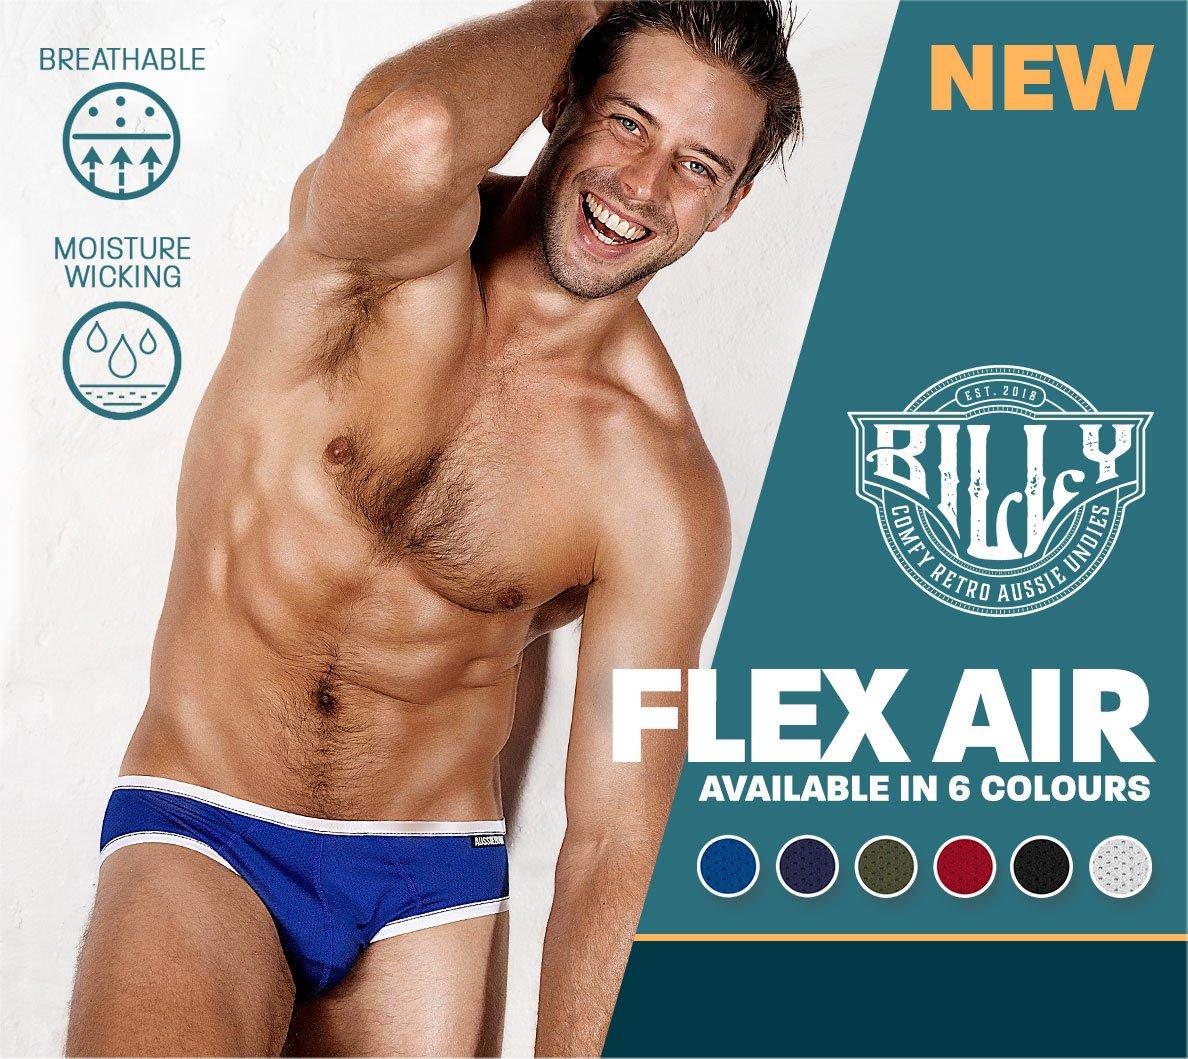 Billy Flex Air Royal Homepage Image